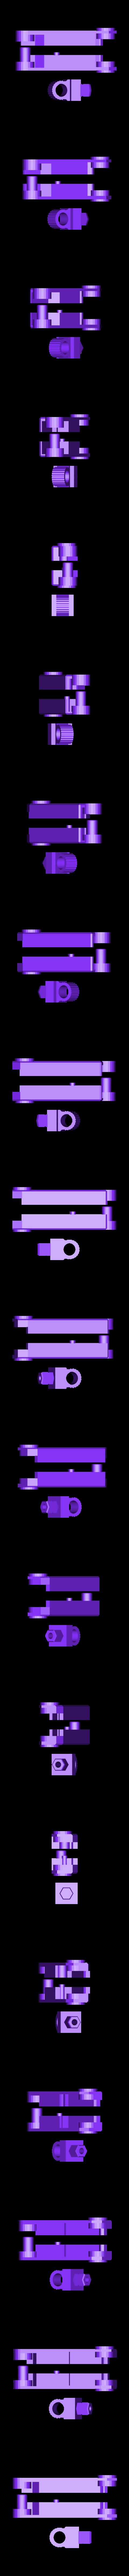 Thighright2.stl Download STL file KO TFC Uranos Upgrade Kit IDW Ver • 3D printer object, Toymakr3D